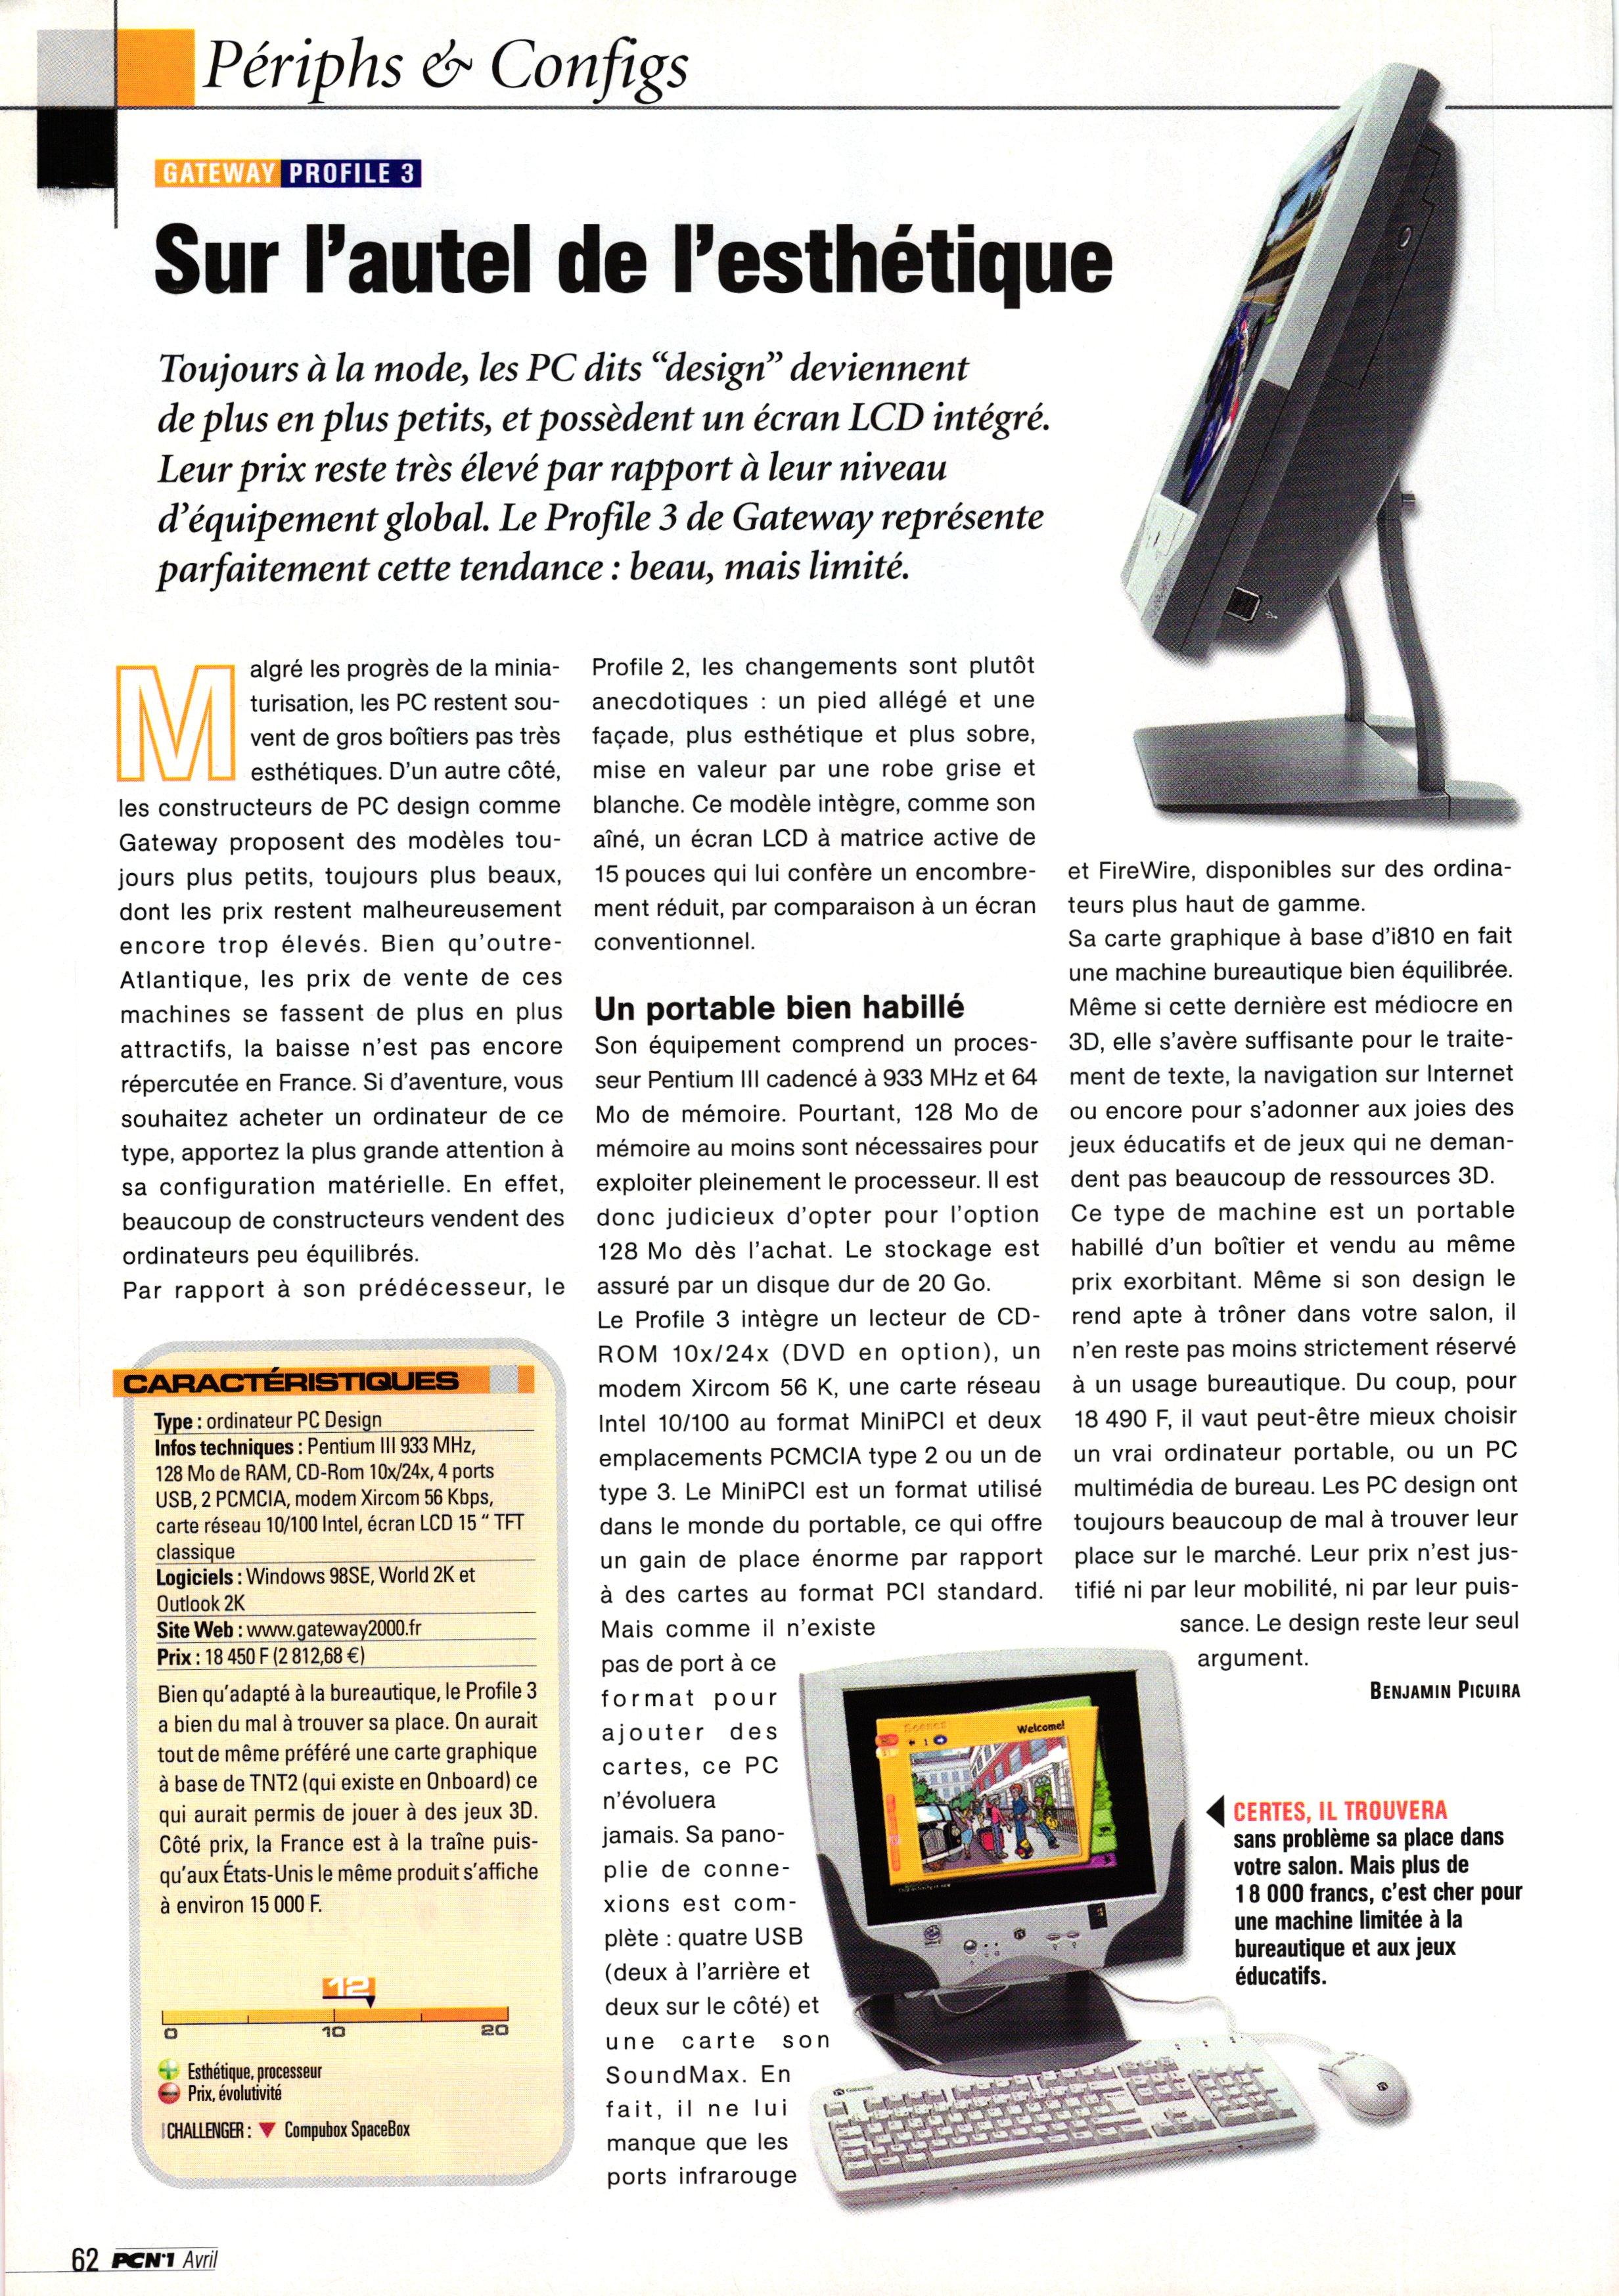 http://download.abandonware.org/magazines/PC%20N1/pcn1_numero15/p_062.jpg